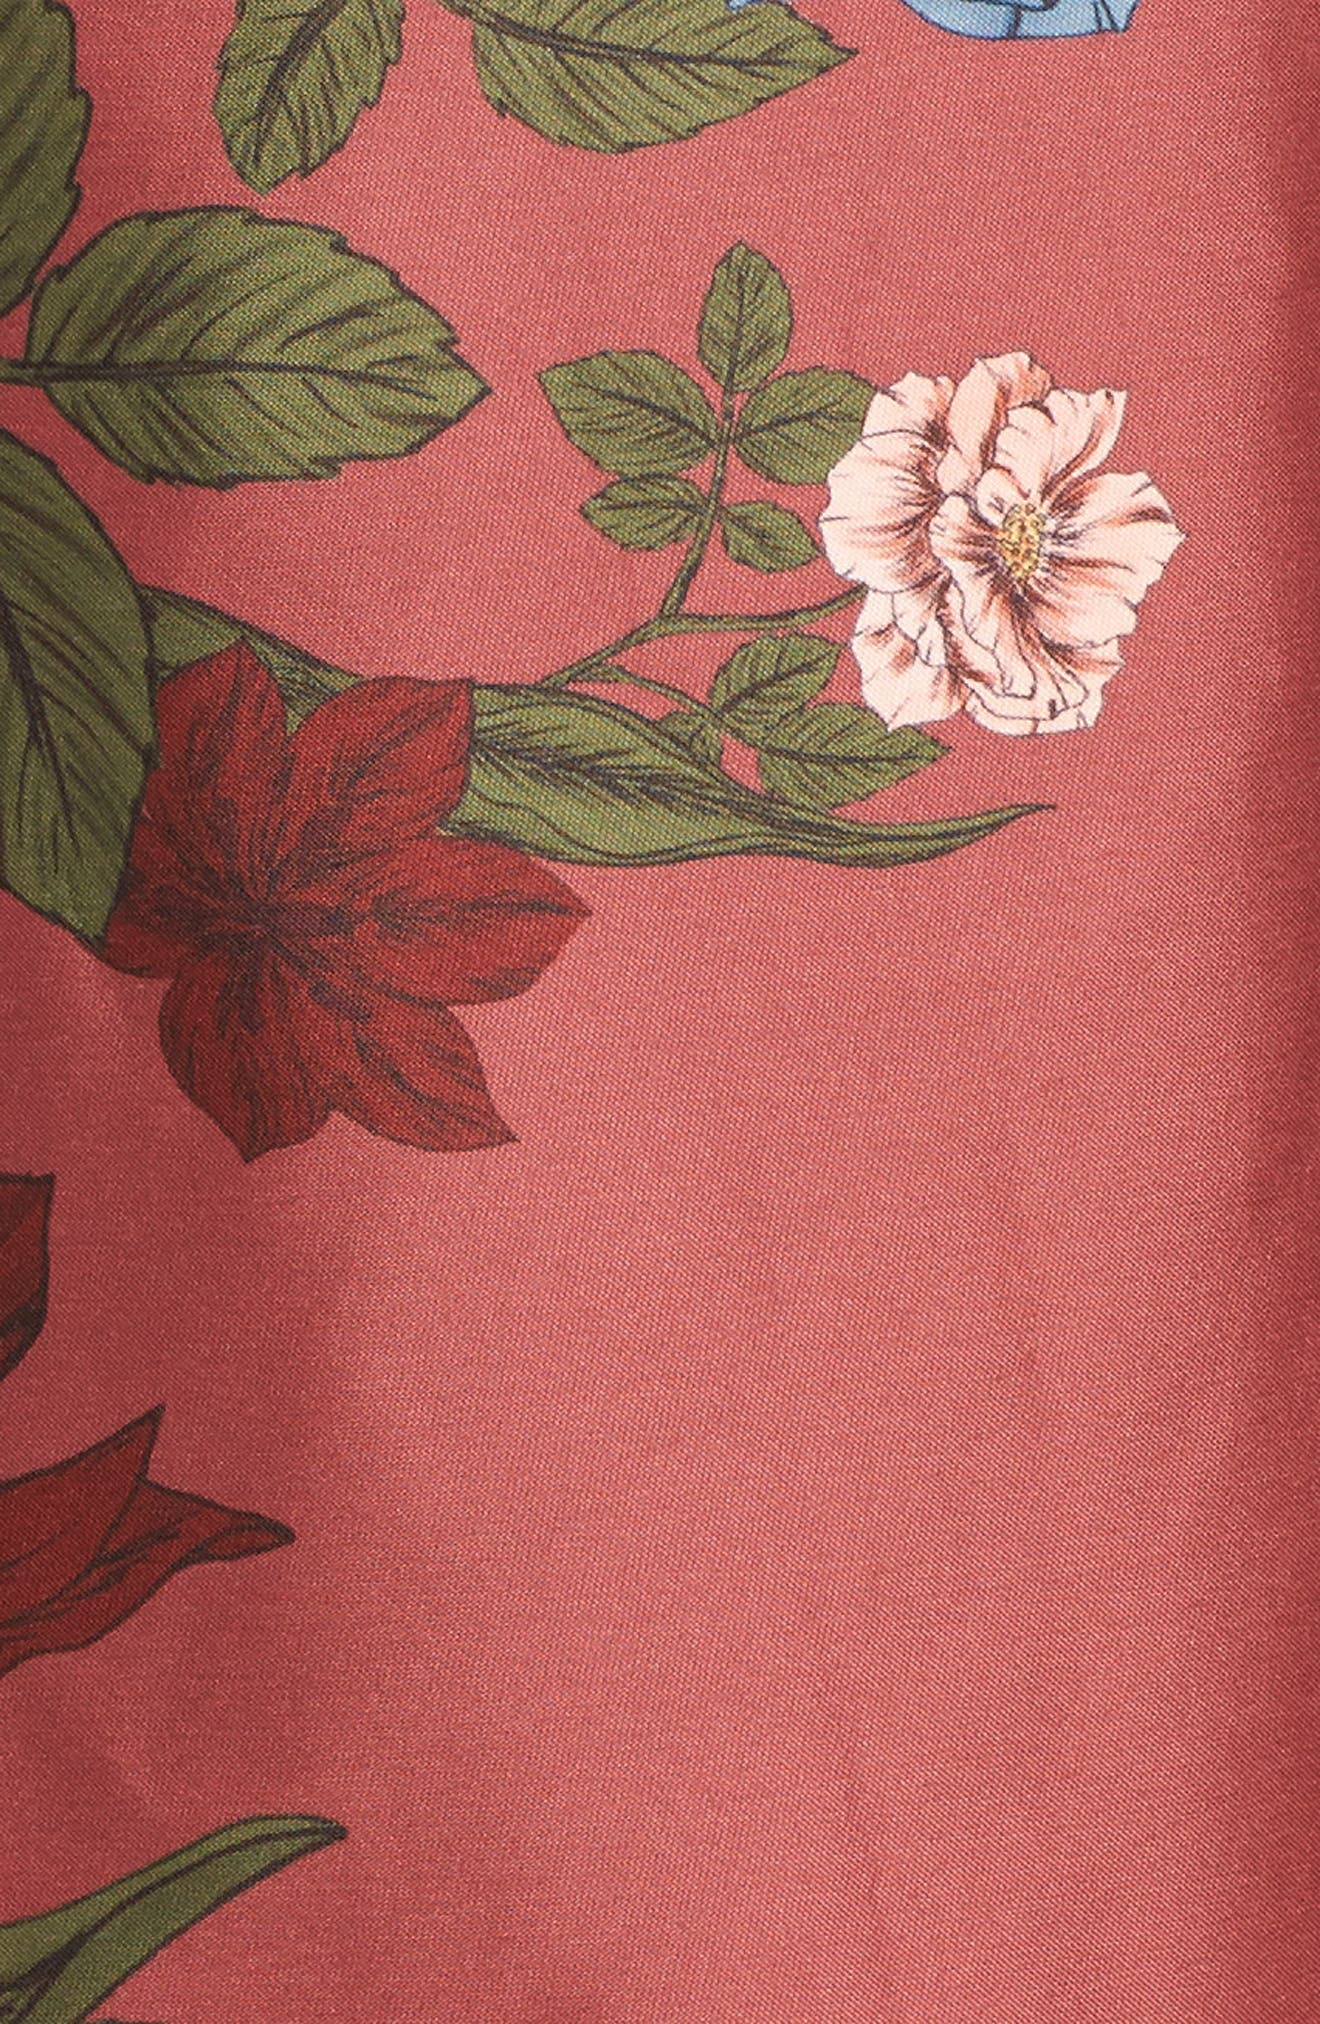 Night Lights Floral Asymmetrical Dress,                             Alternate thumbnail 5, color,                             Spice Floral